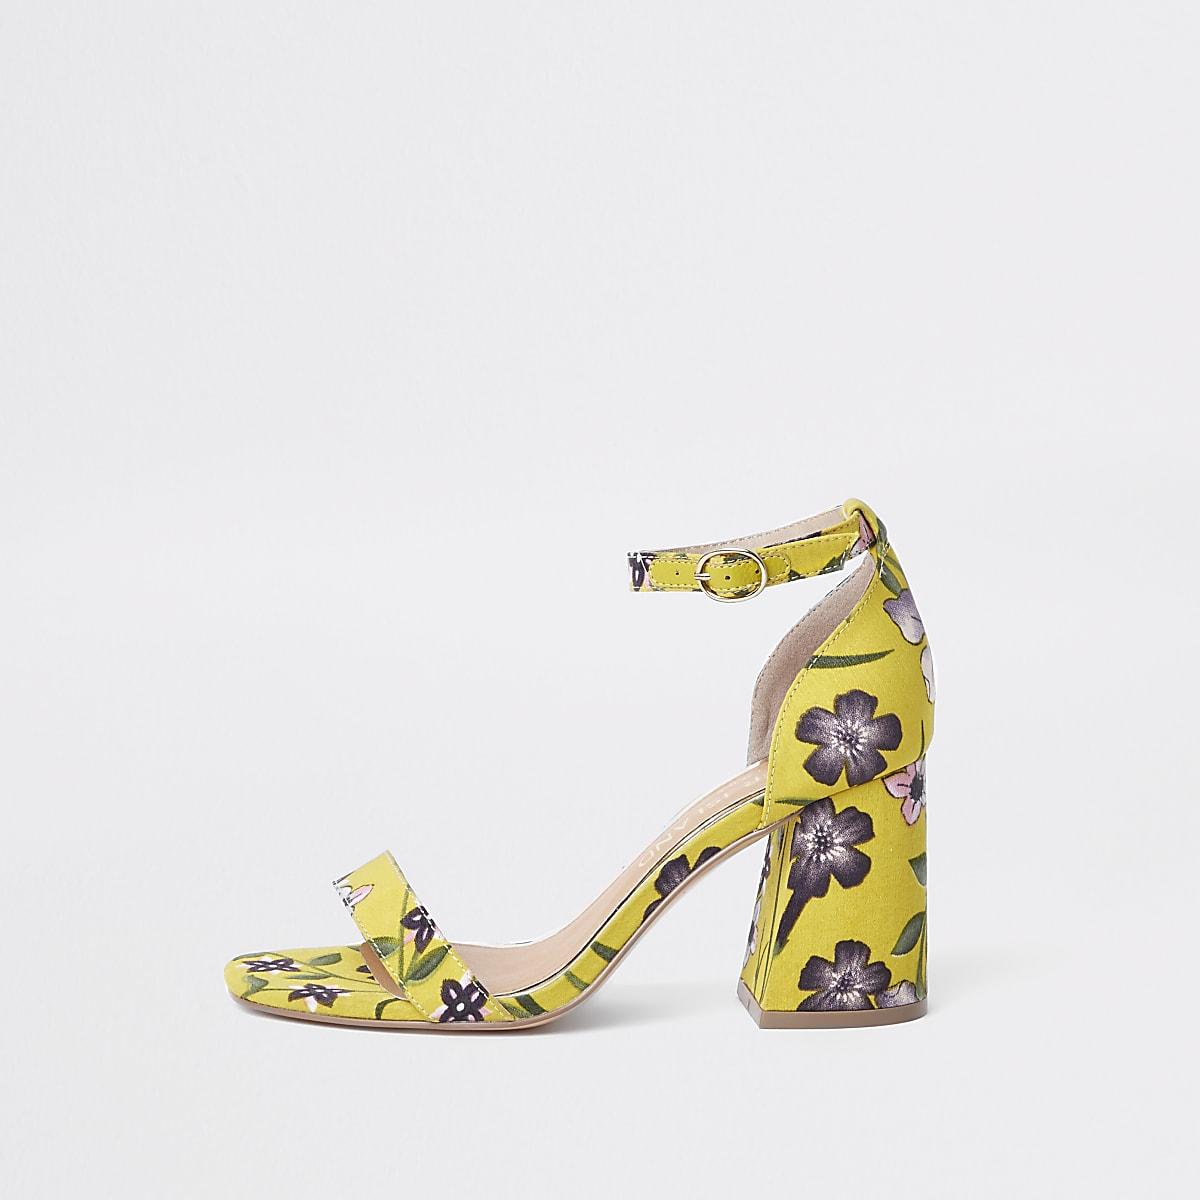 d9d549a99 Yellow wide fit floral block heel sandals - Sandals - Shoes   Boots - women